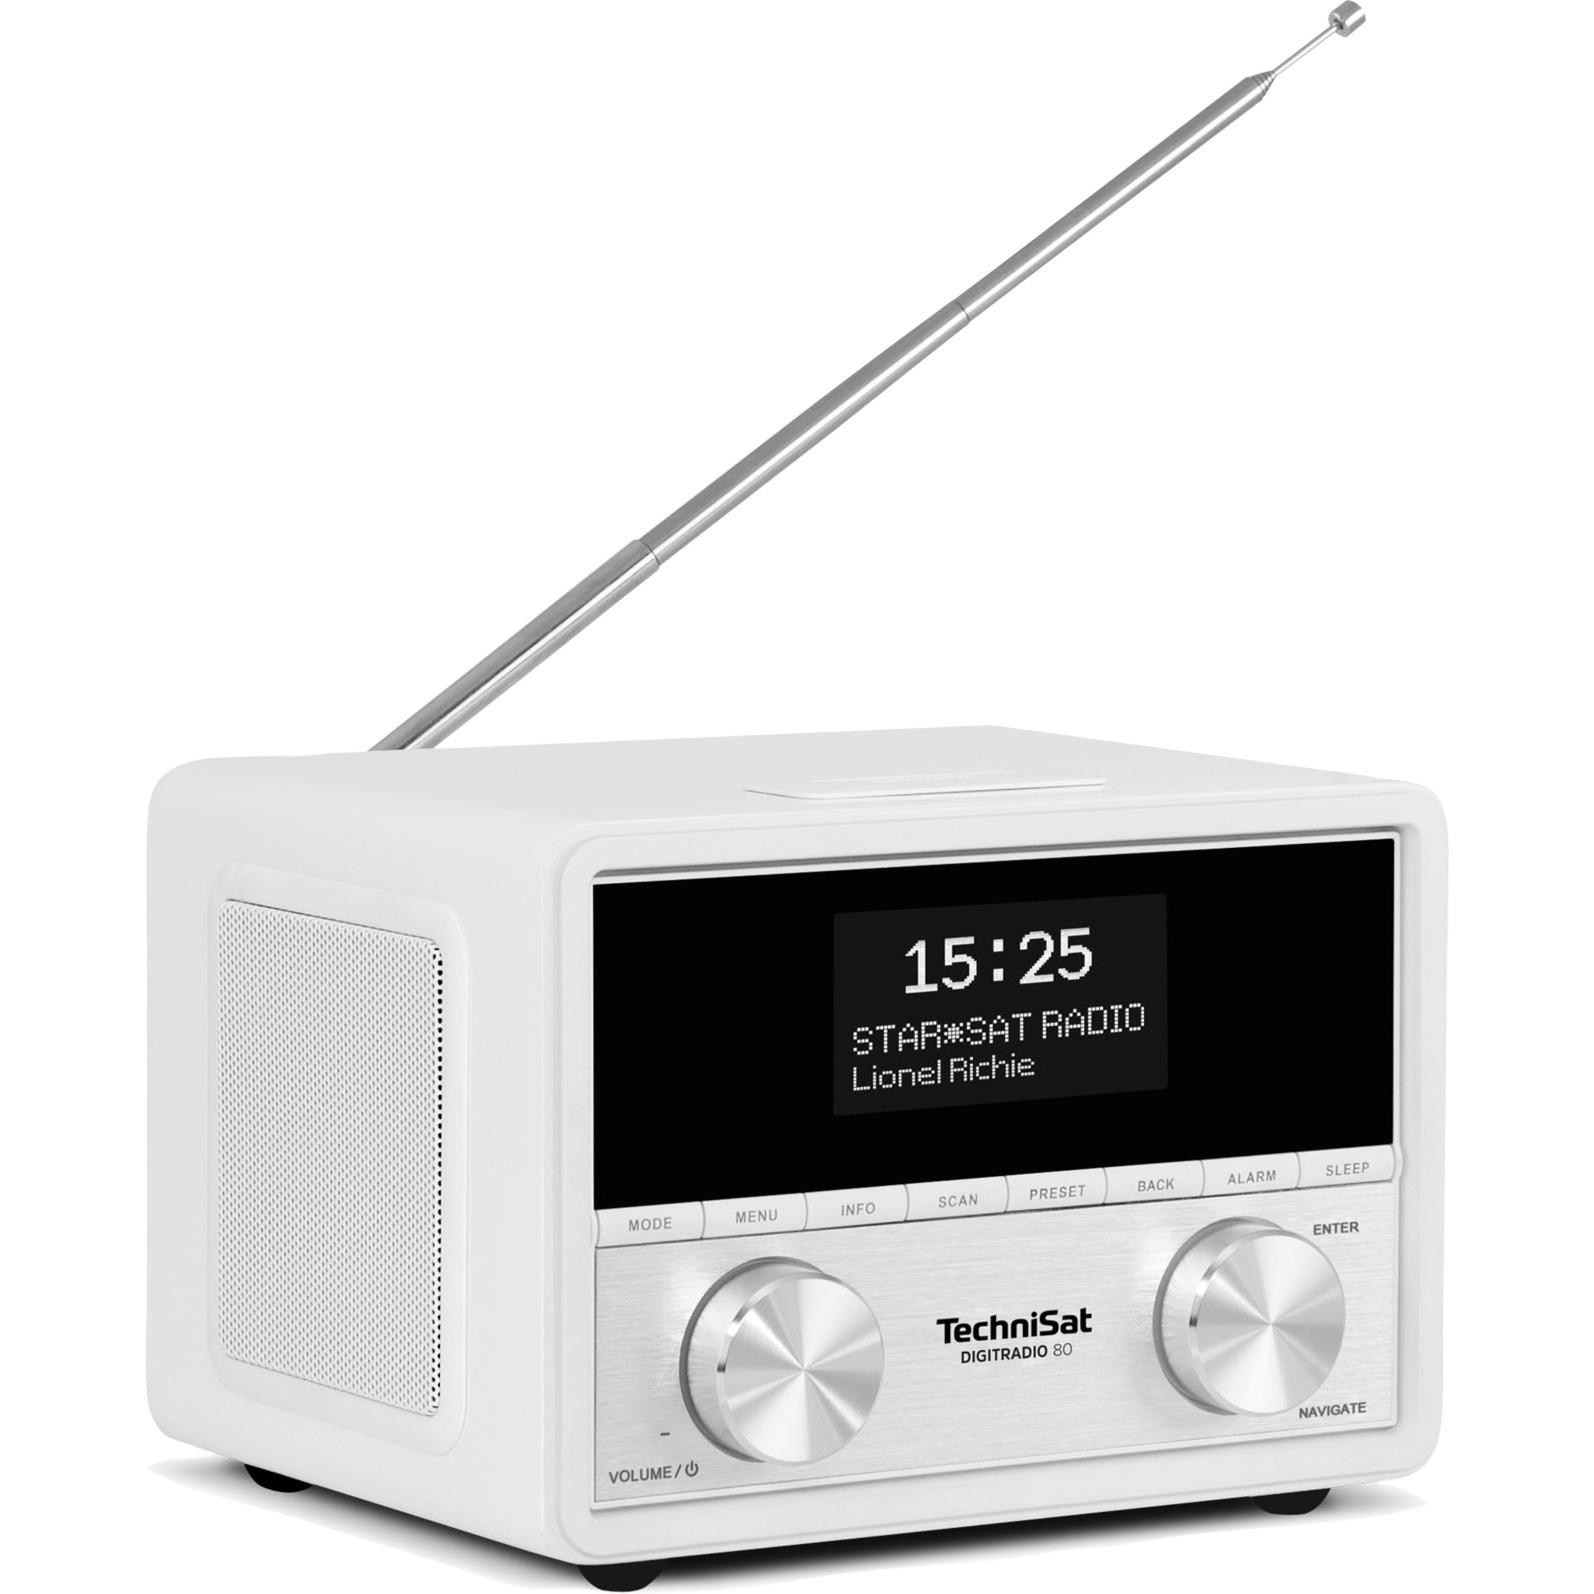 digitradio-80-digital-10w-hvid-radiomodtager-radiovakkeur